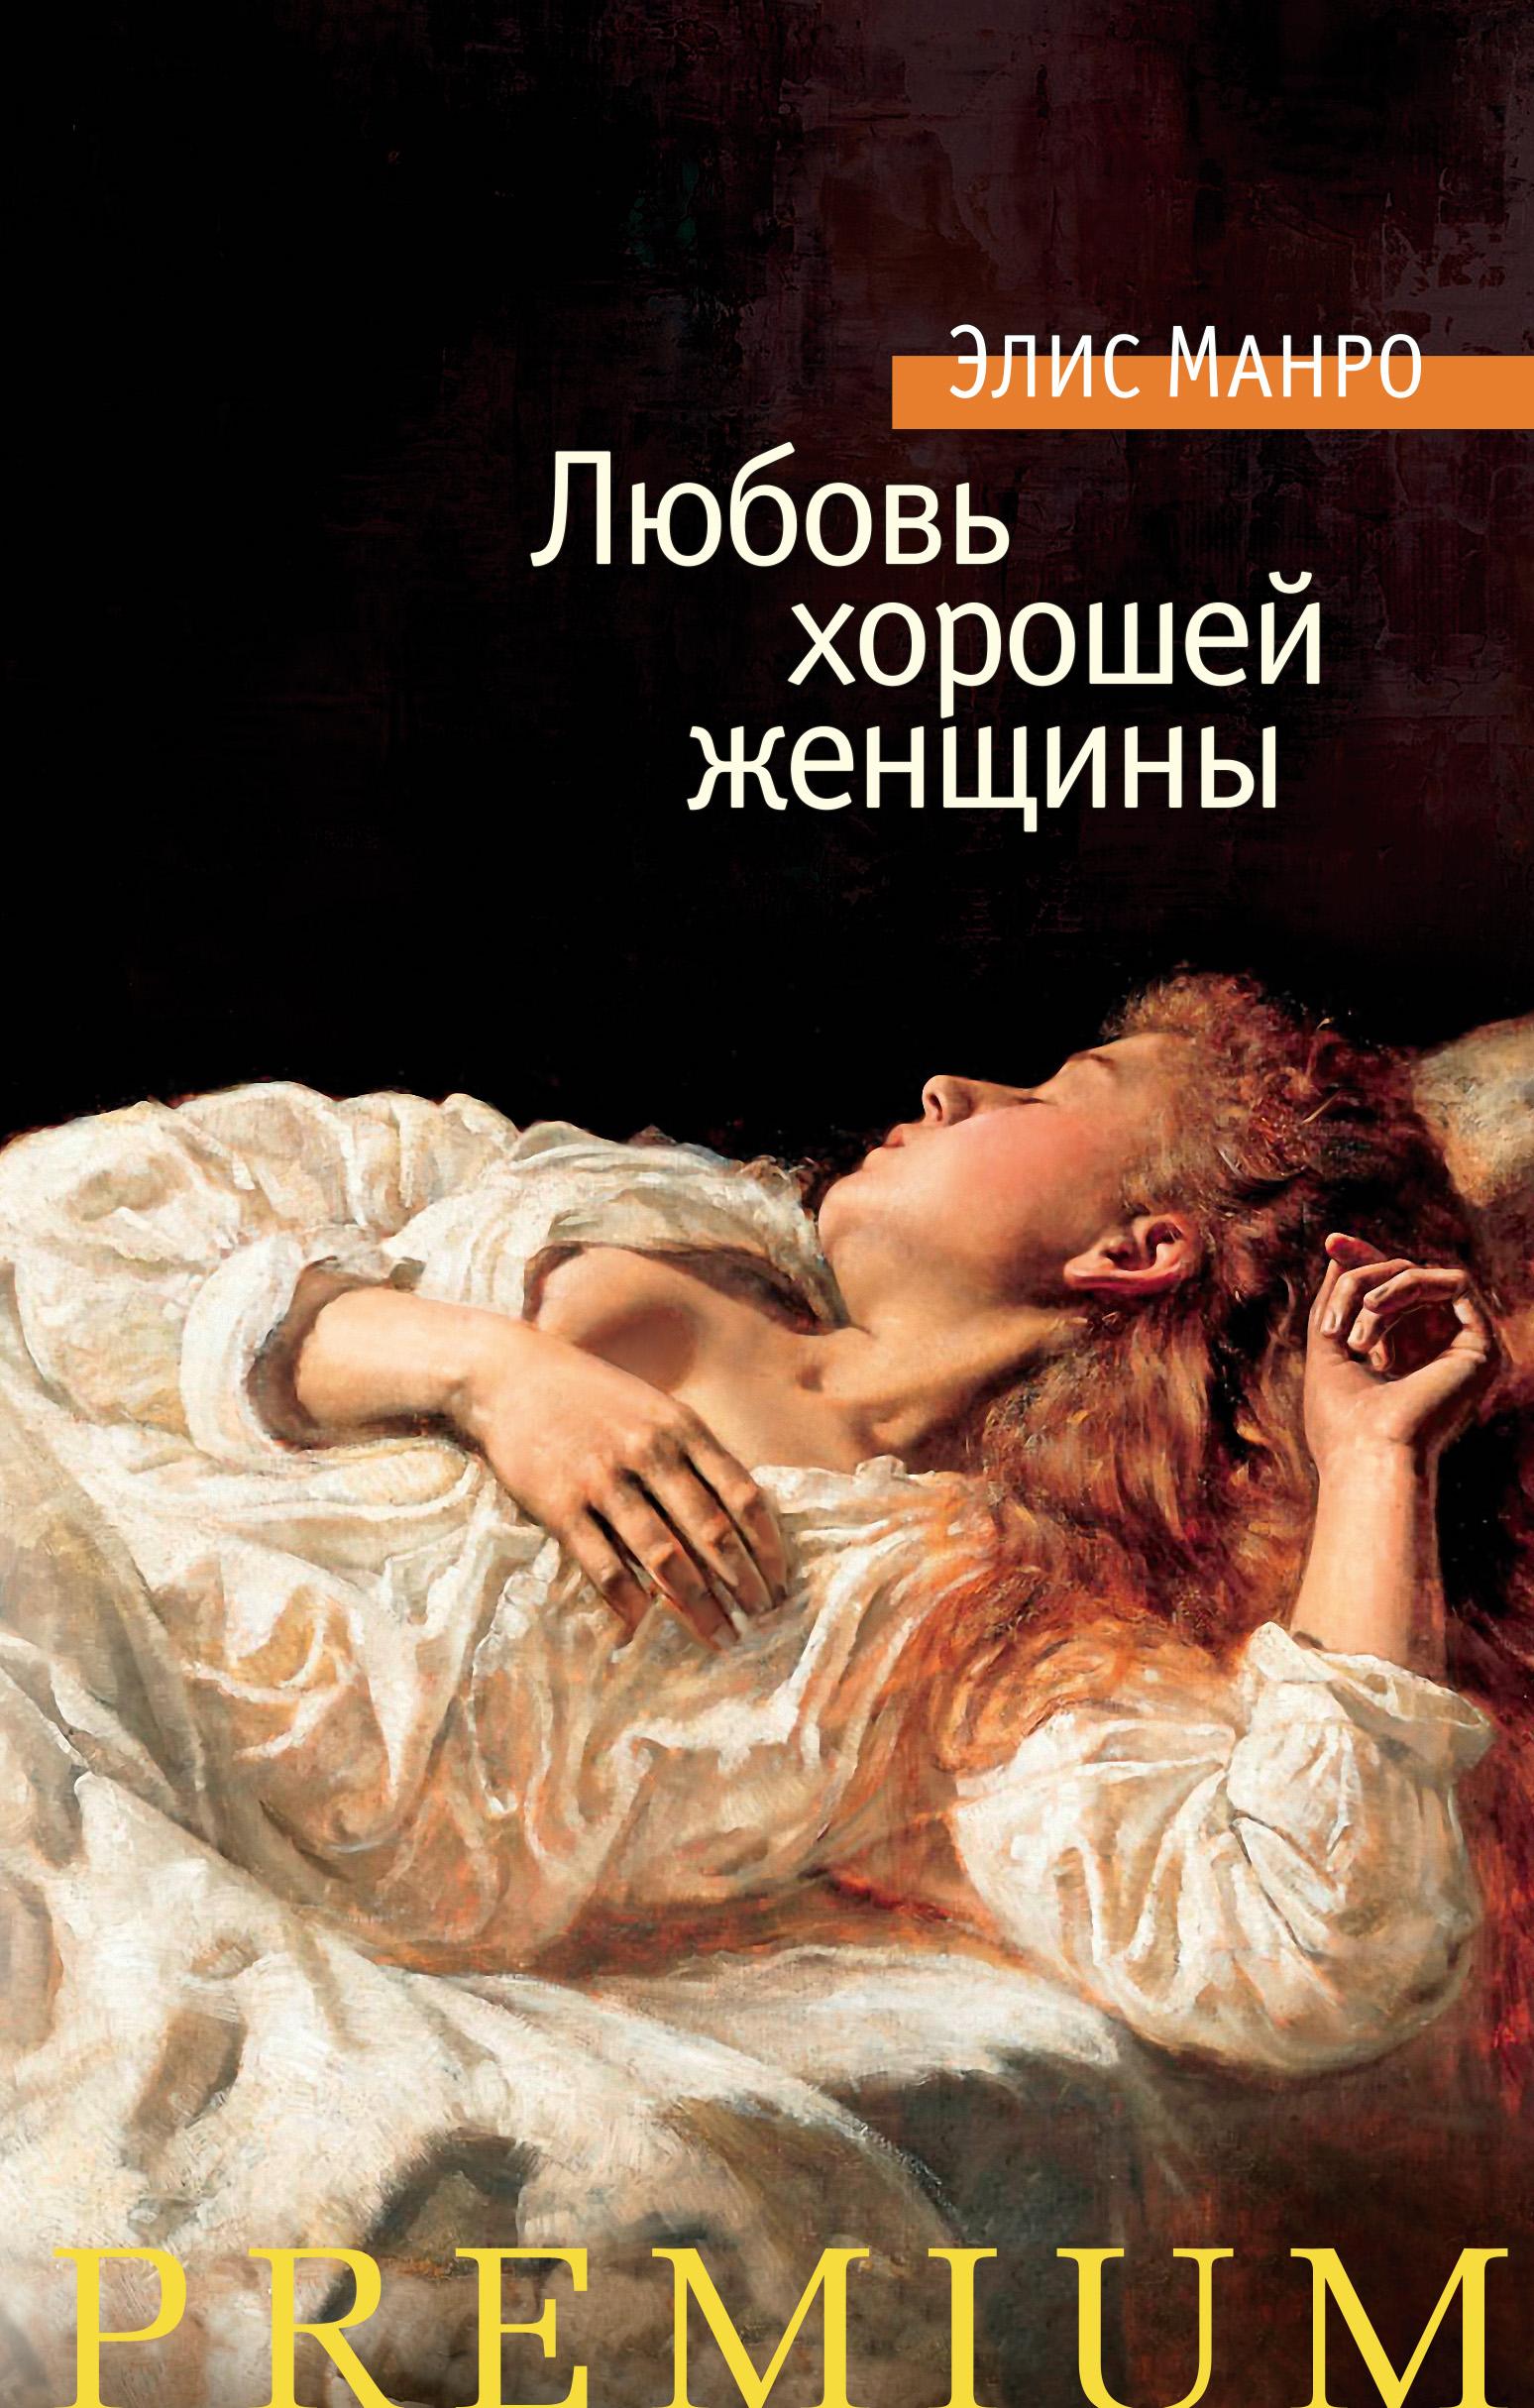 Элис Манро Любовь хорошей женщины (сборник) элис манро друг моей юности сборник